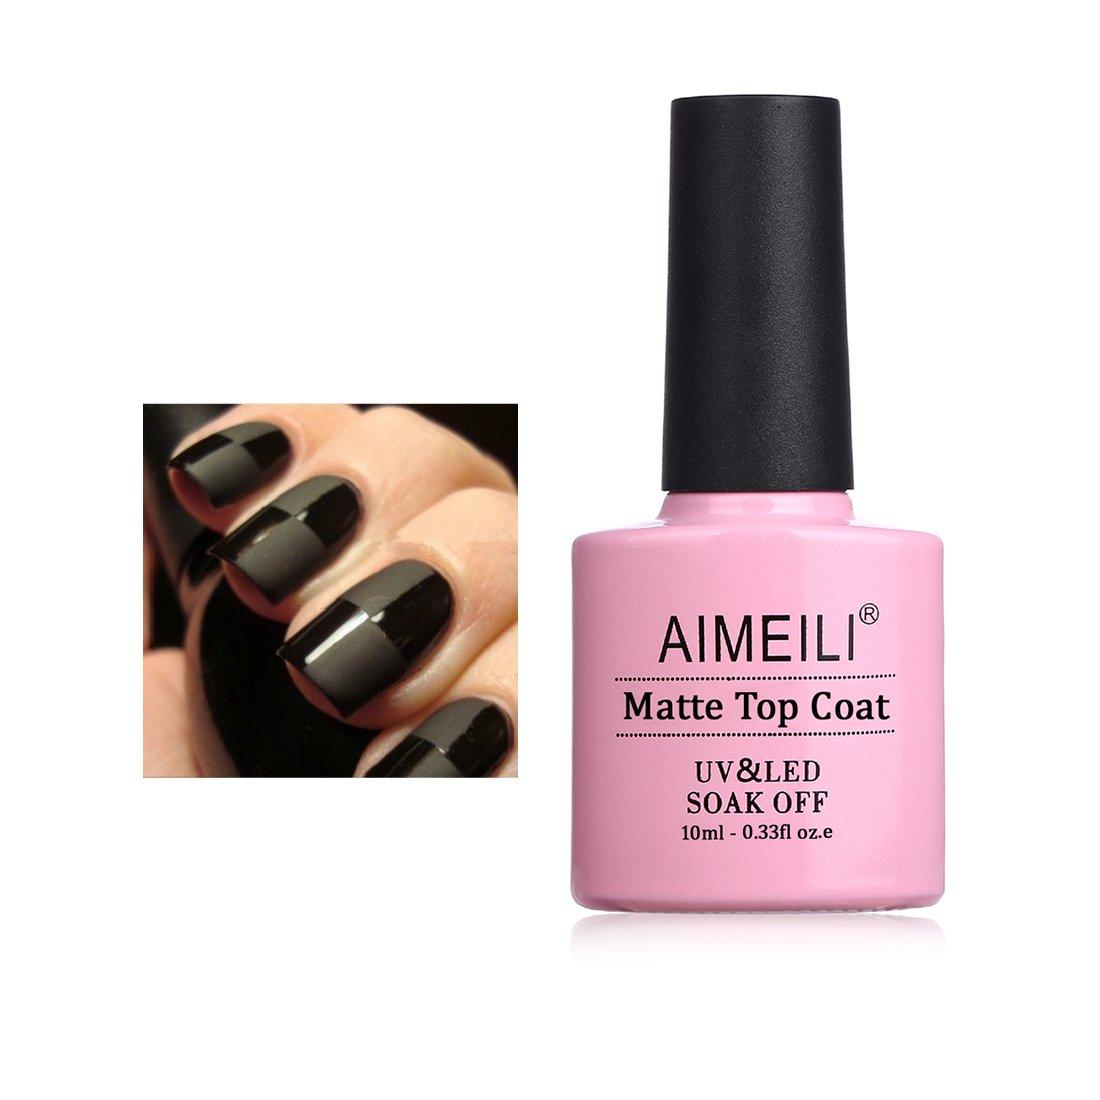 AIMEILI Soak Off UV LED Gel Nail Polish - No Wipe Matte Top Coat 10ml